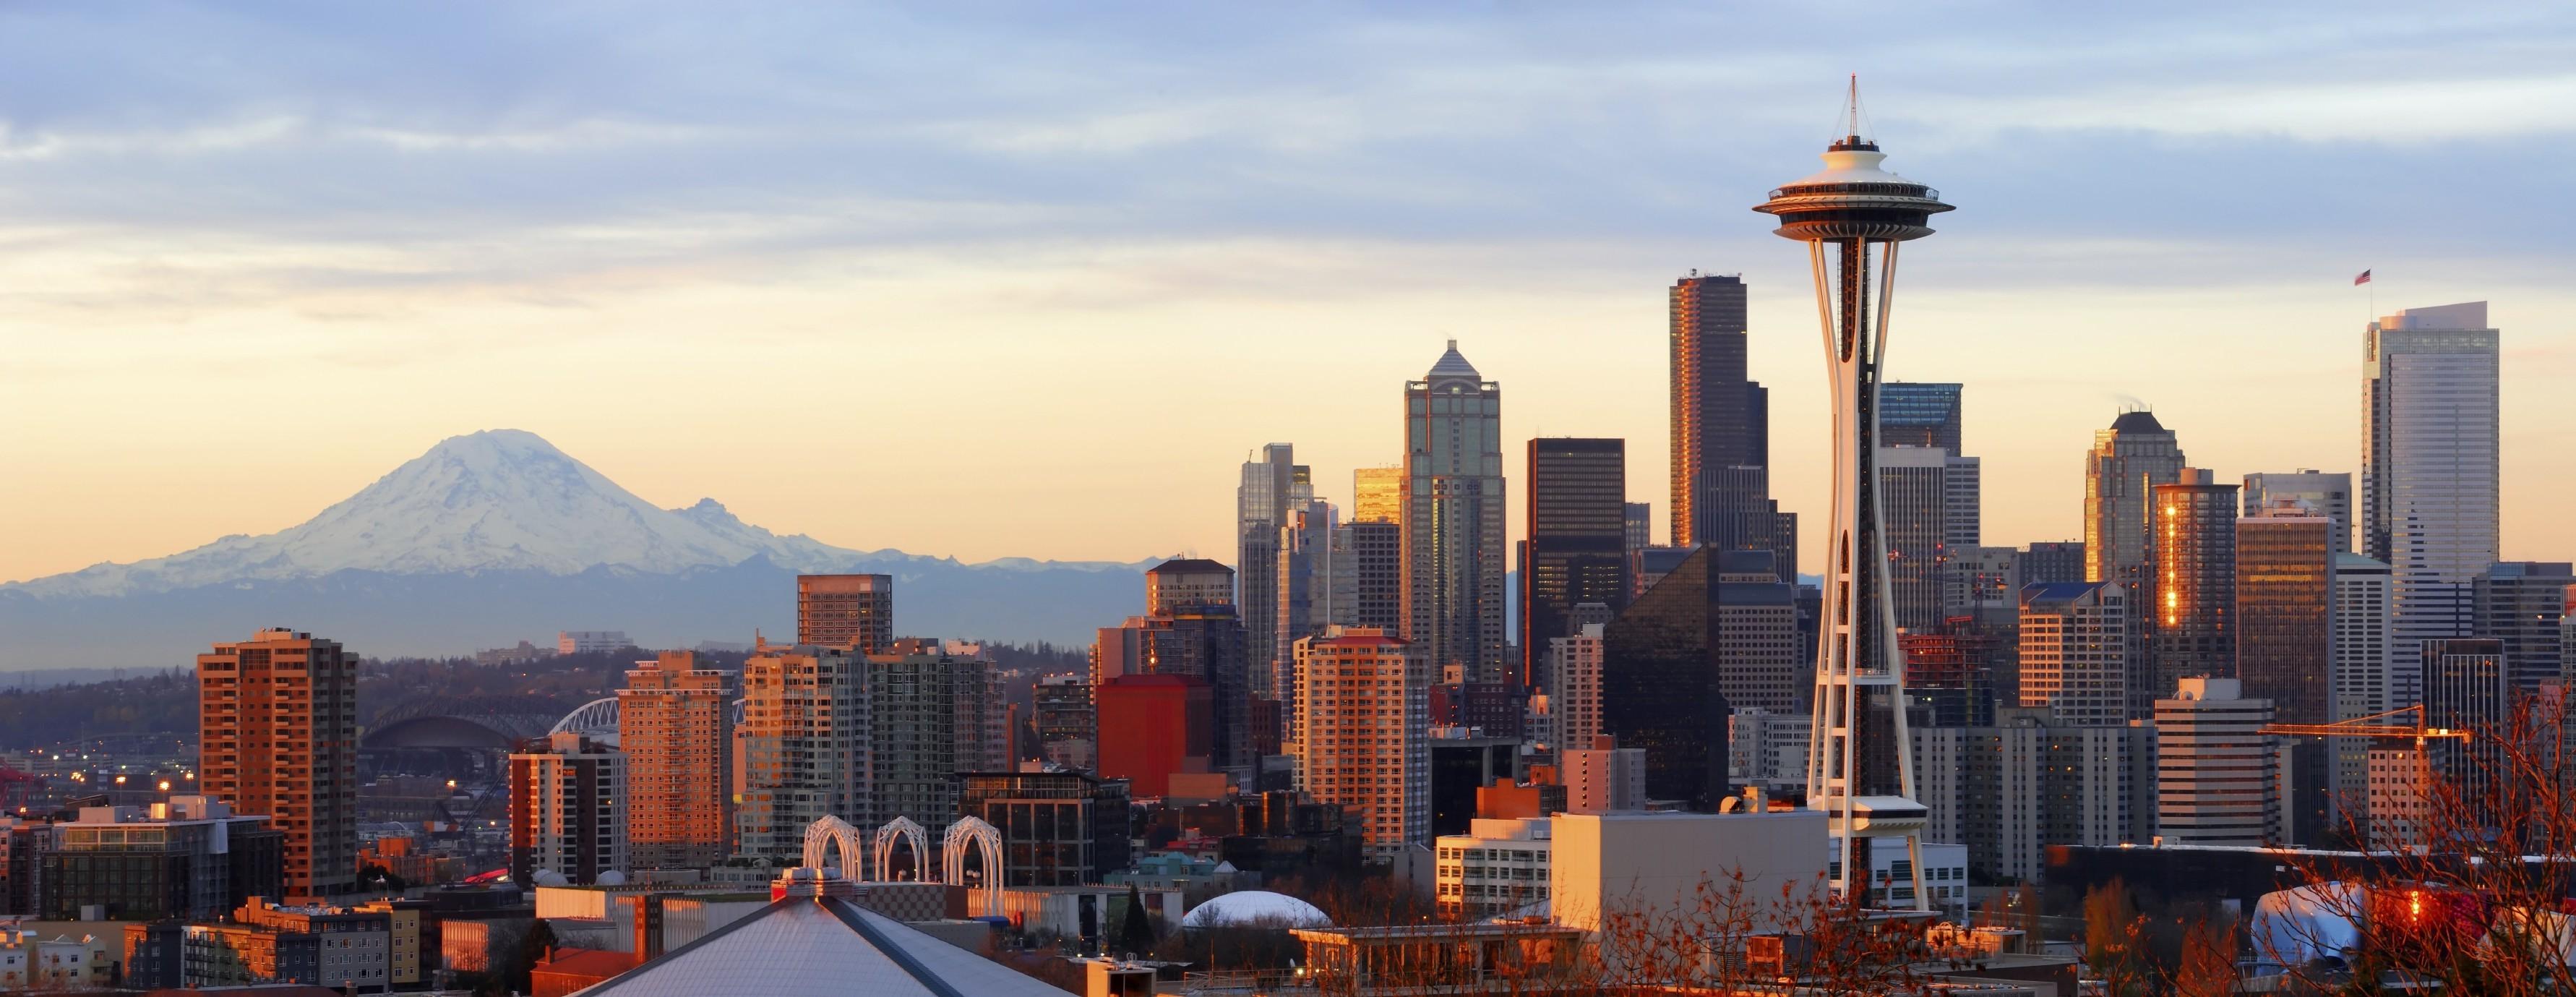 Braves Wallpaper Iphone Seattle Skyline Wallpaper 69 Images